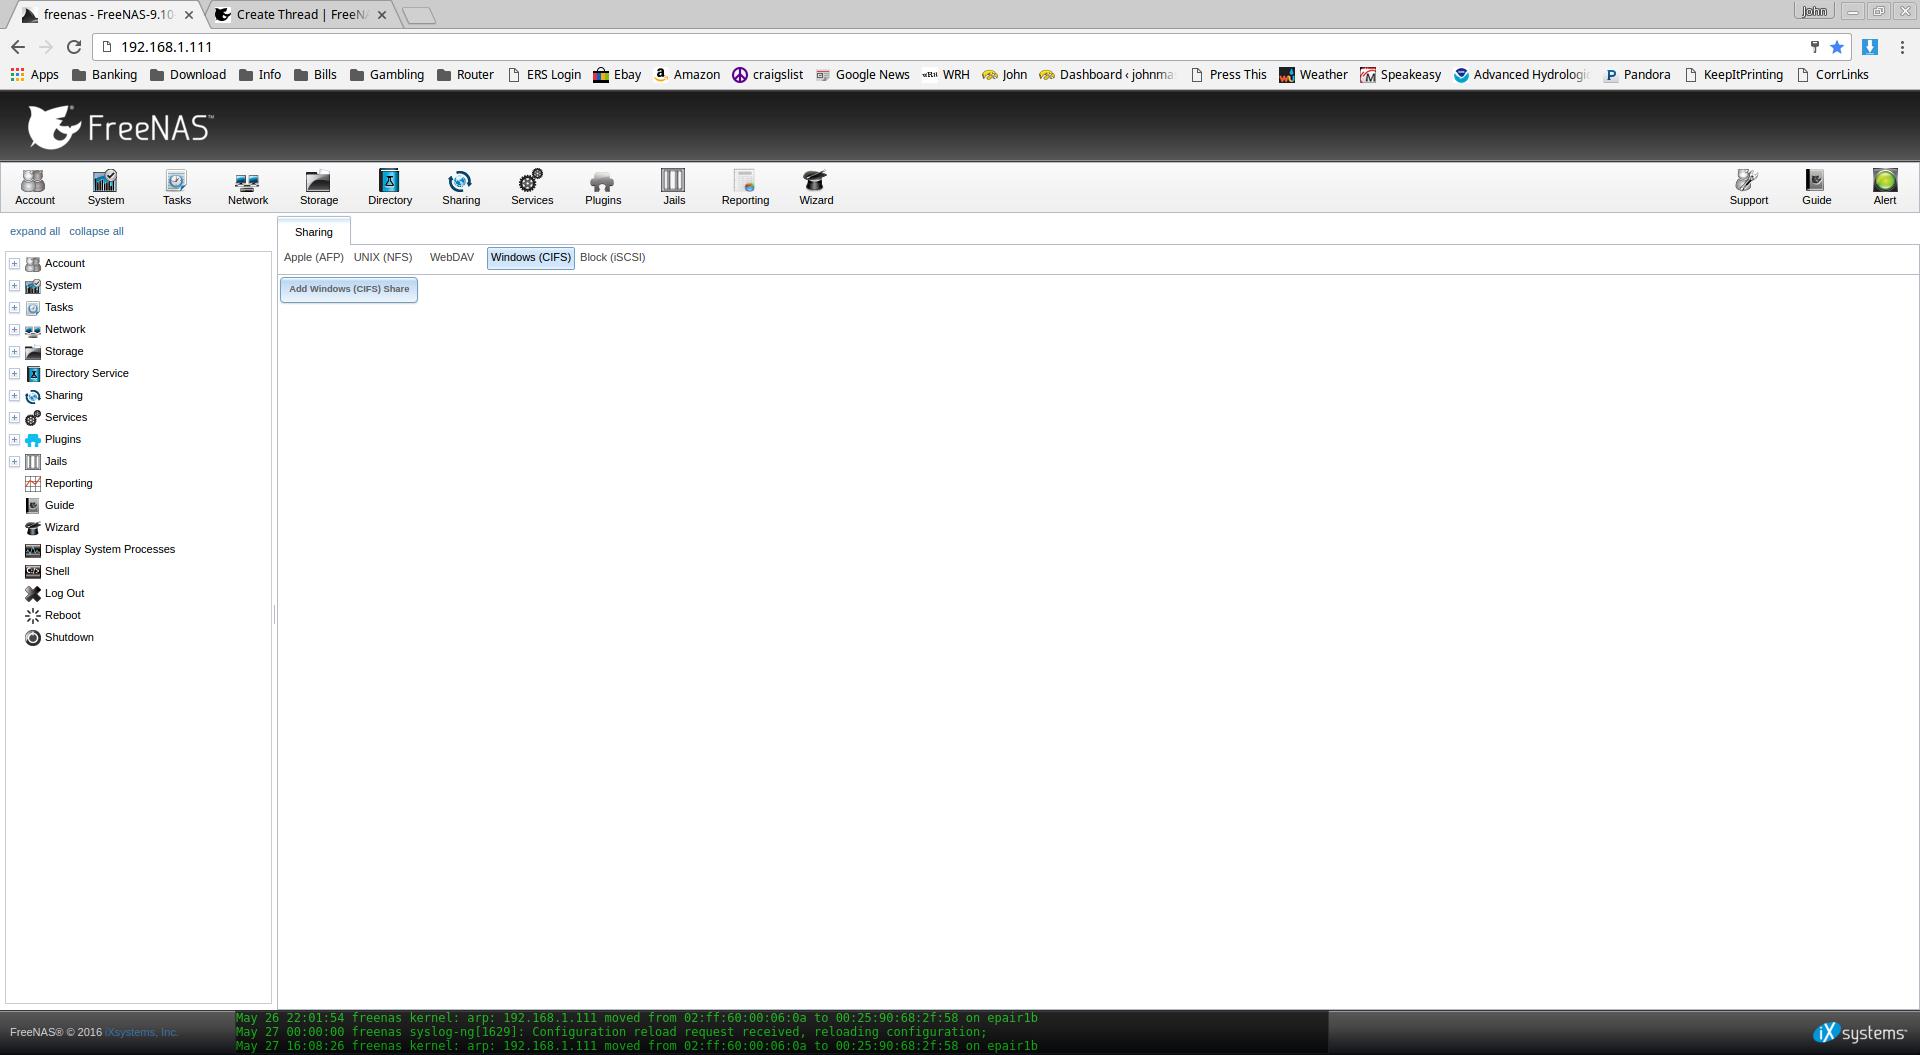 WebGUI broken in Chrome - Tabs for Storage, Jails, Plugins, etc not